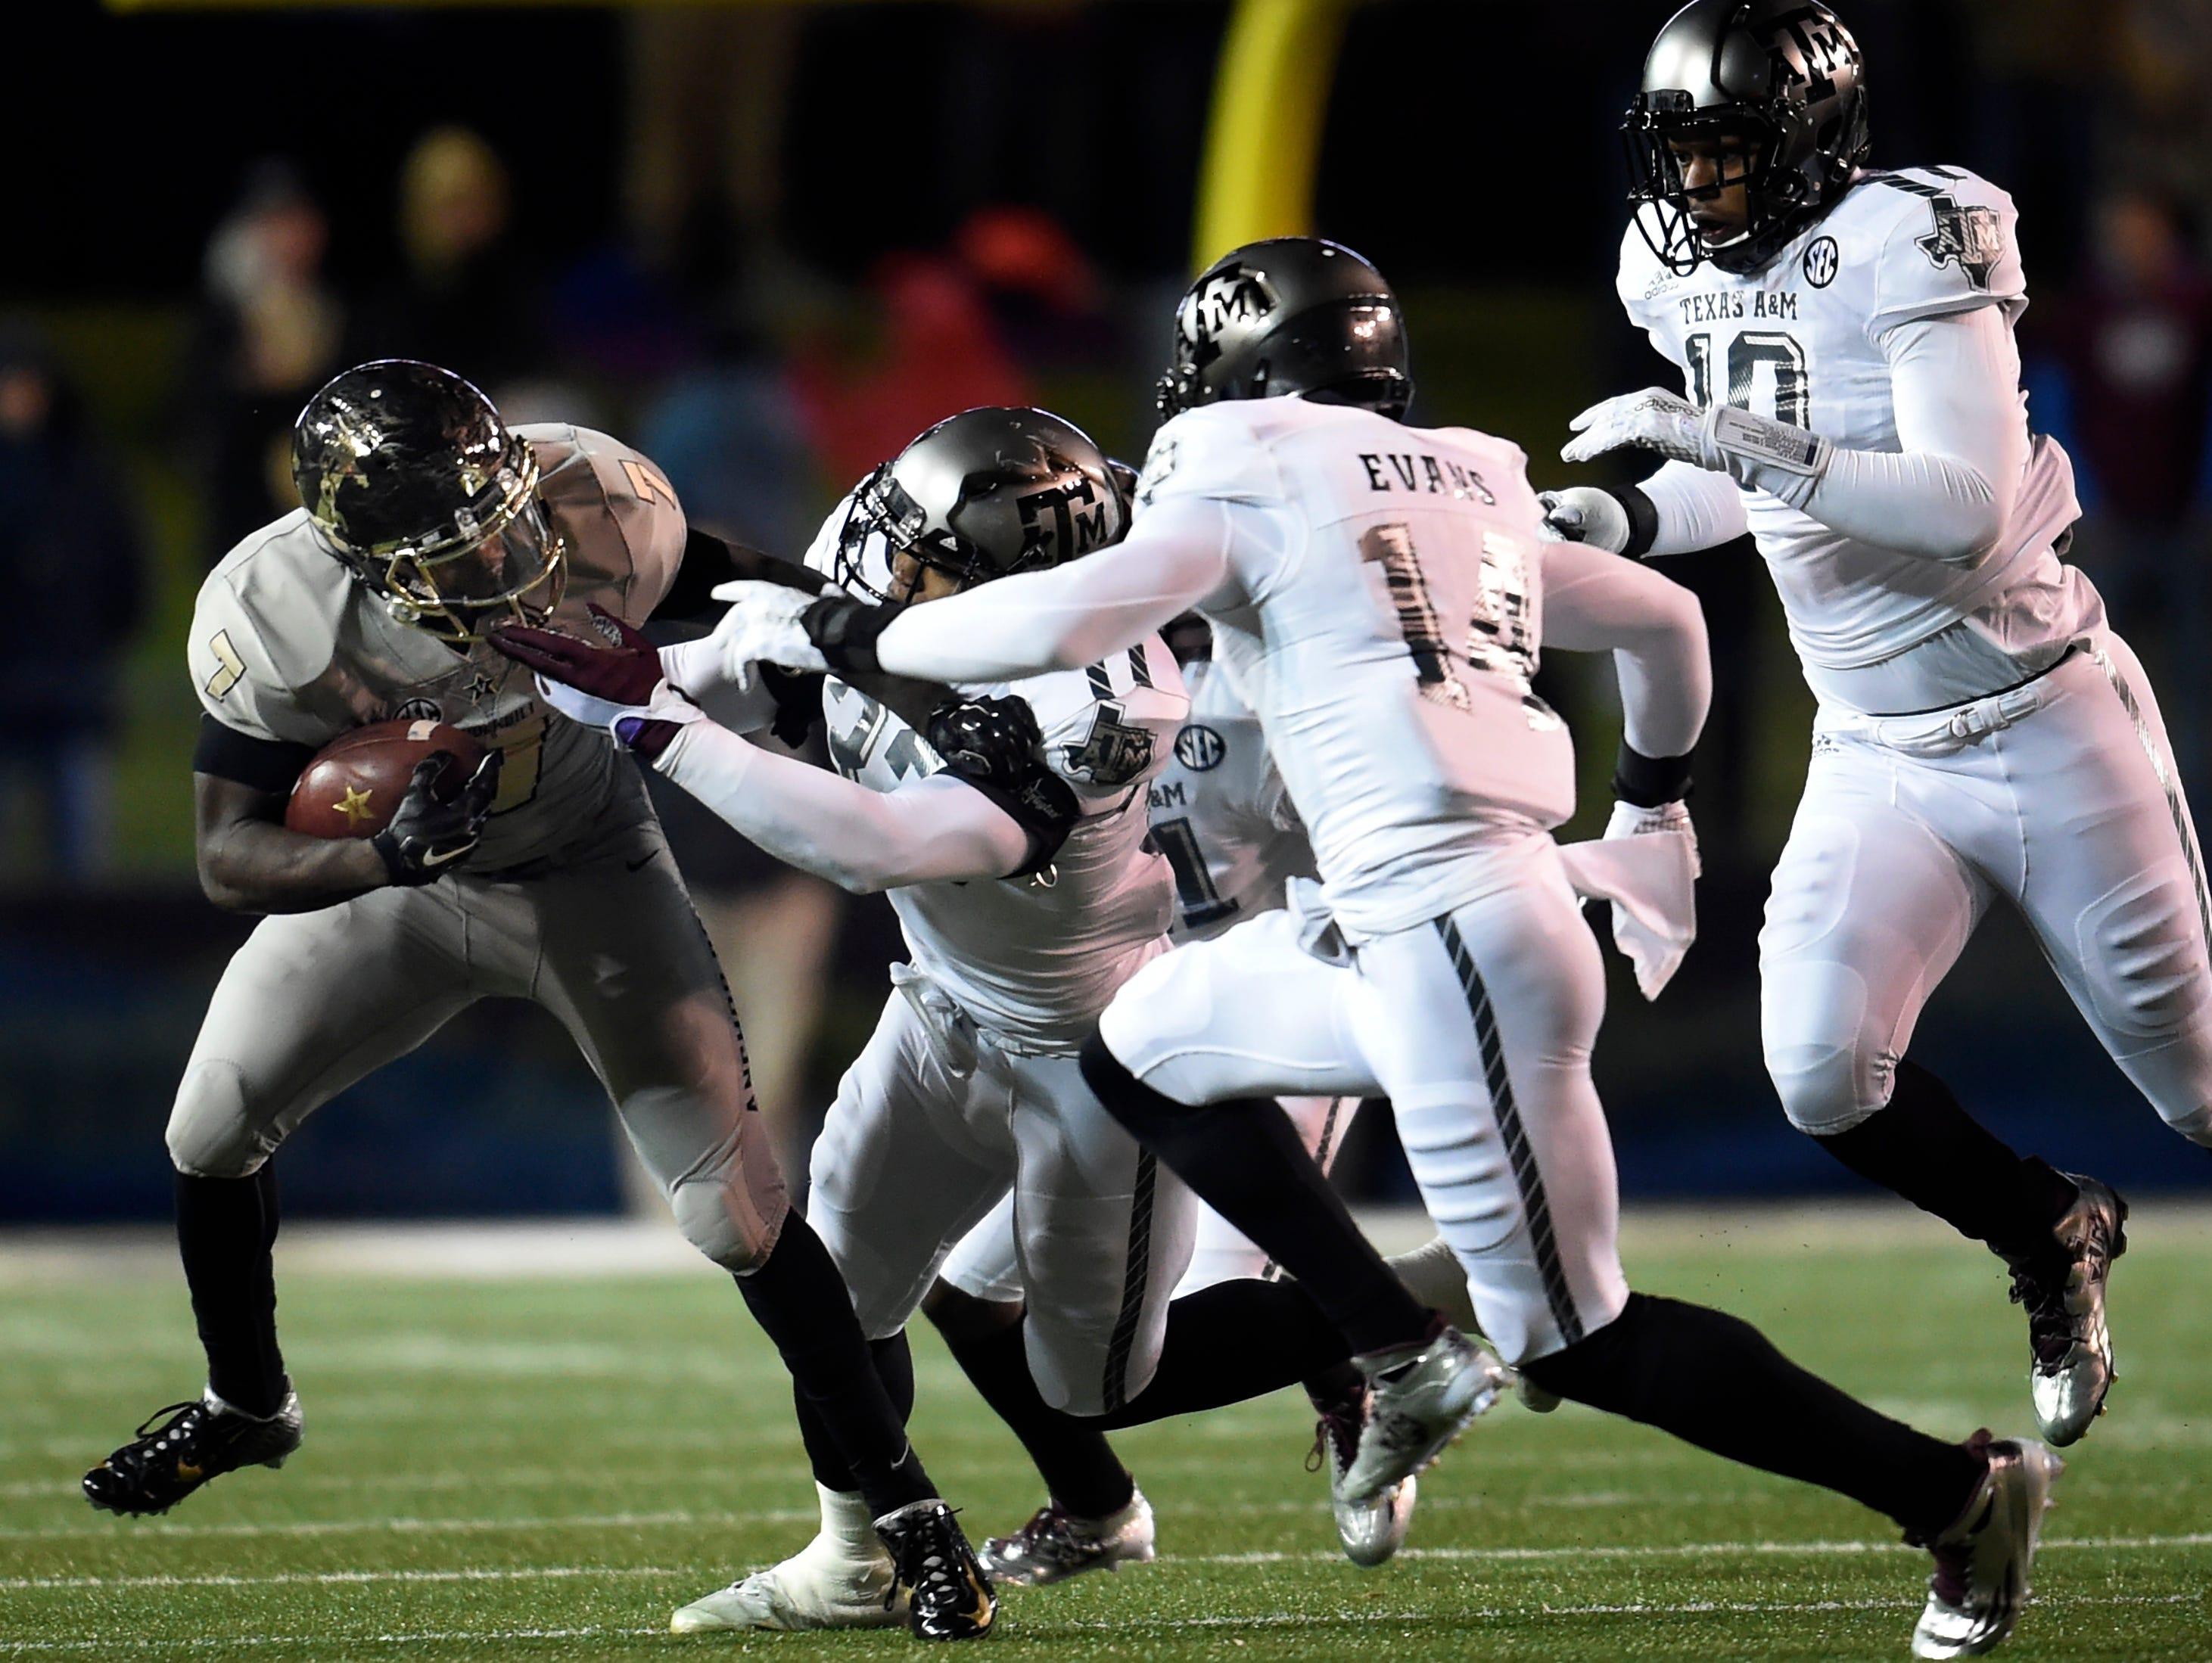 Vanderbilt running back Ralph Webb (7) tries to pull away from the Texas A&M defense on Nov. 21, 2015.